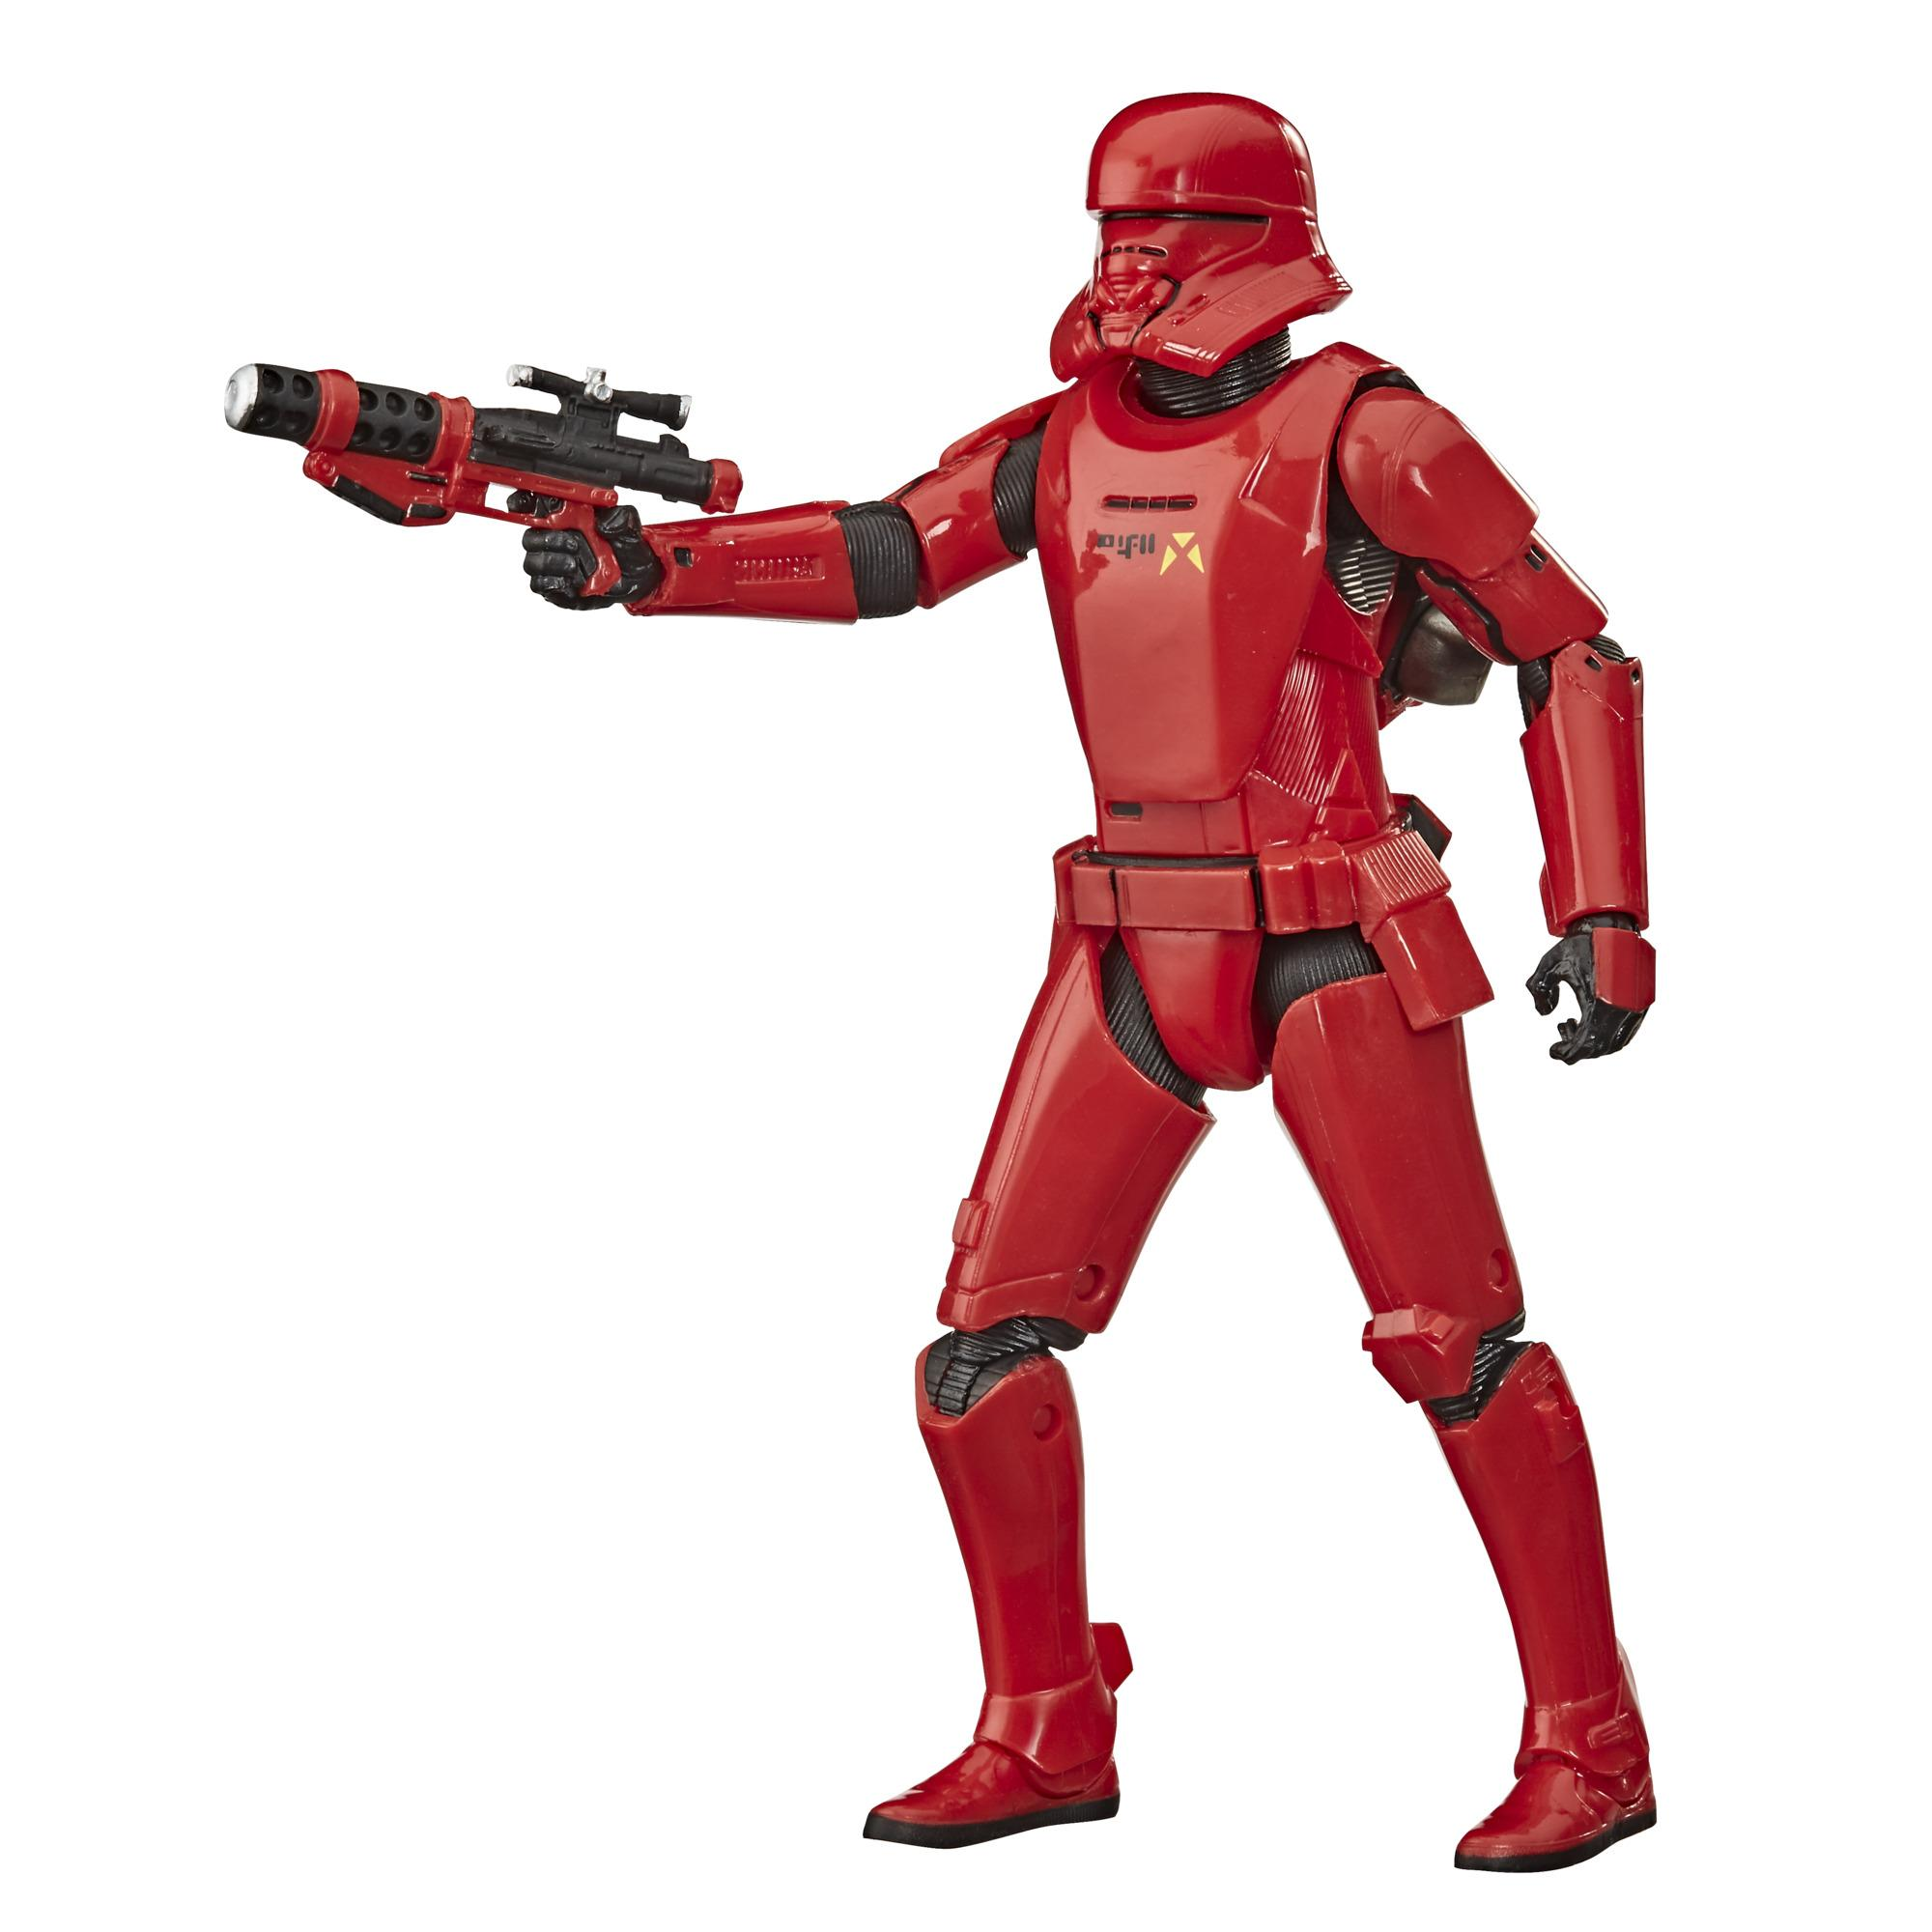 Star Wars The Black Series - Sith Jet Trooper - Figura de 15 cm de Star Wars: El ascenso de Skywalker